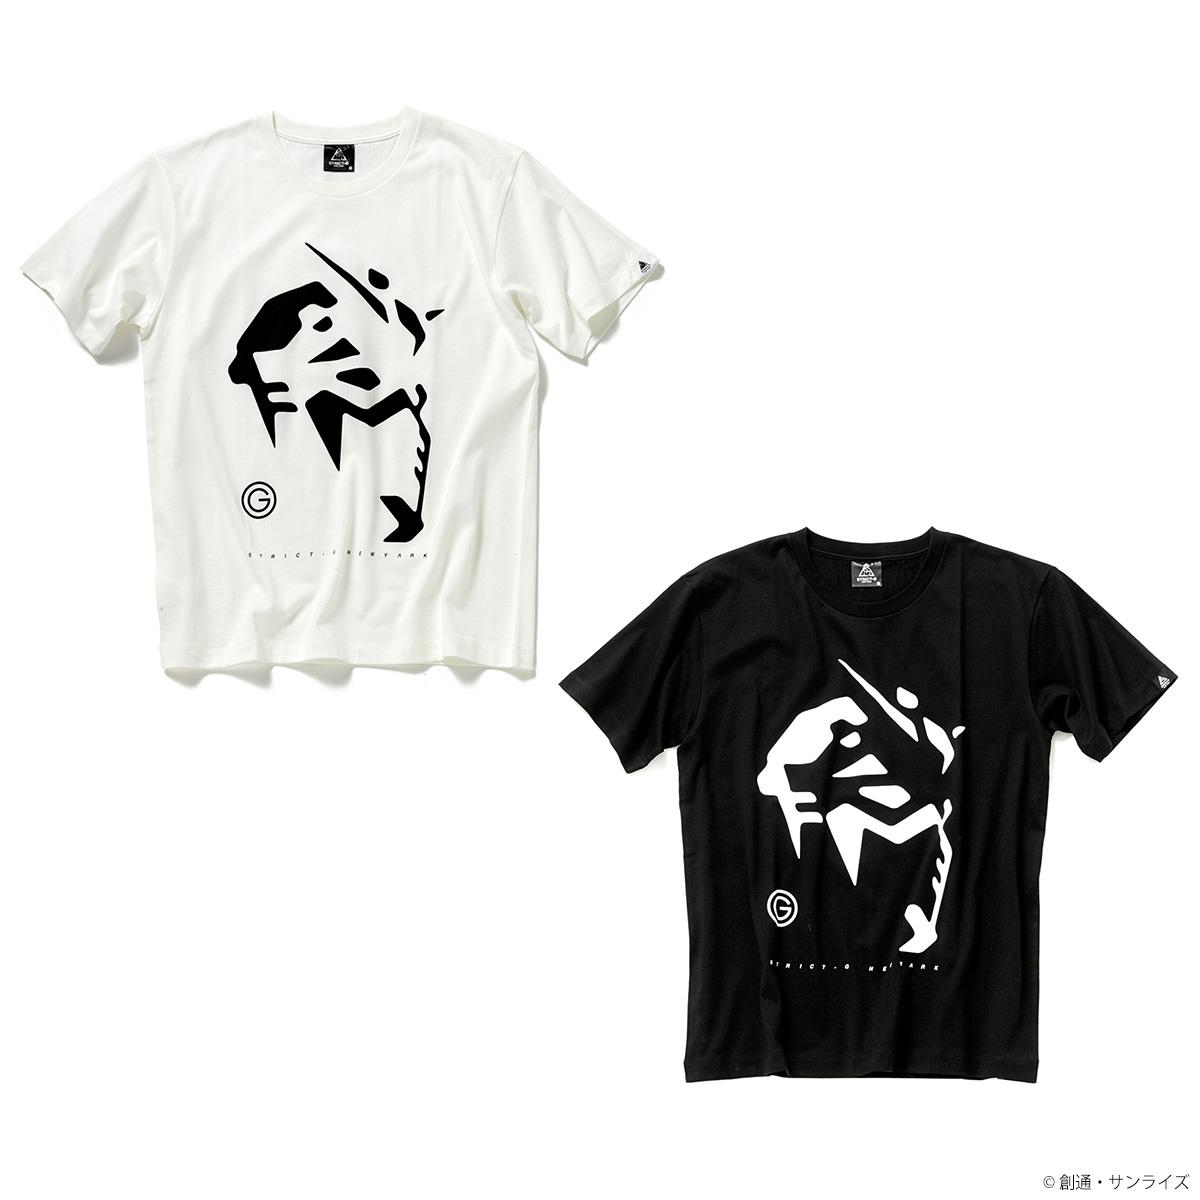 STRICT-G NEW YARK Tシャツ ガンダムフェイス柄